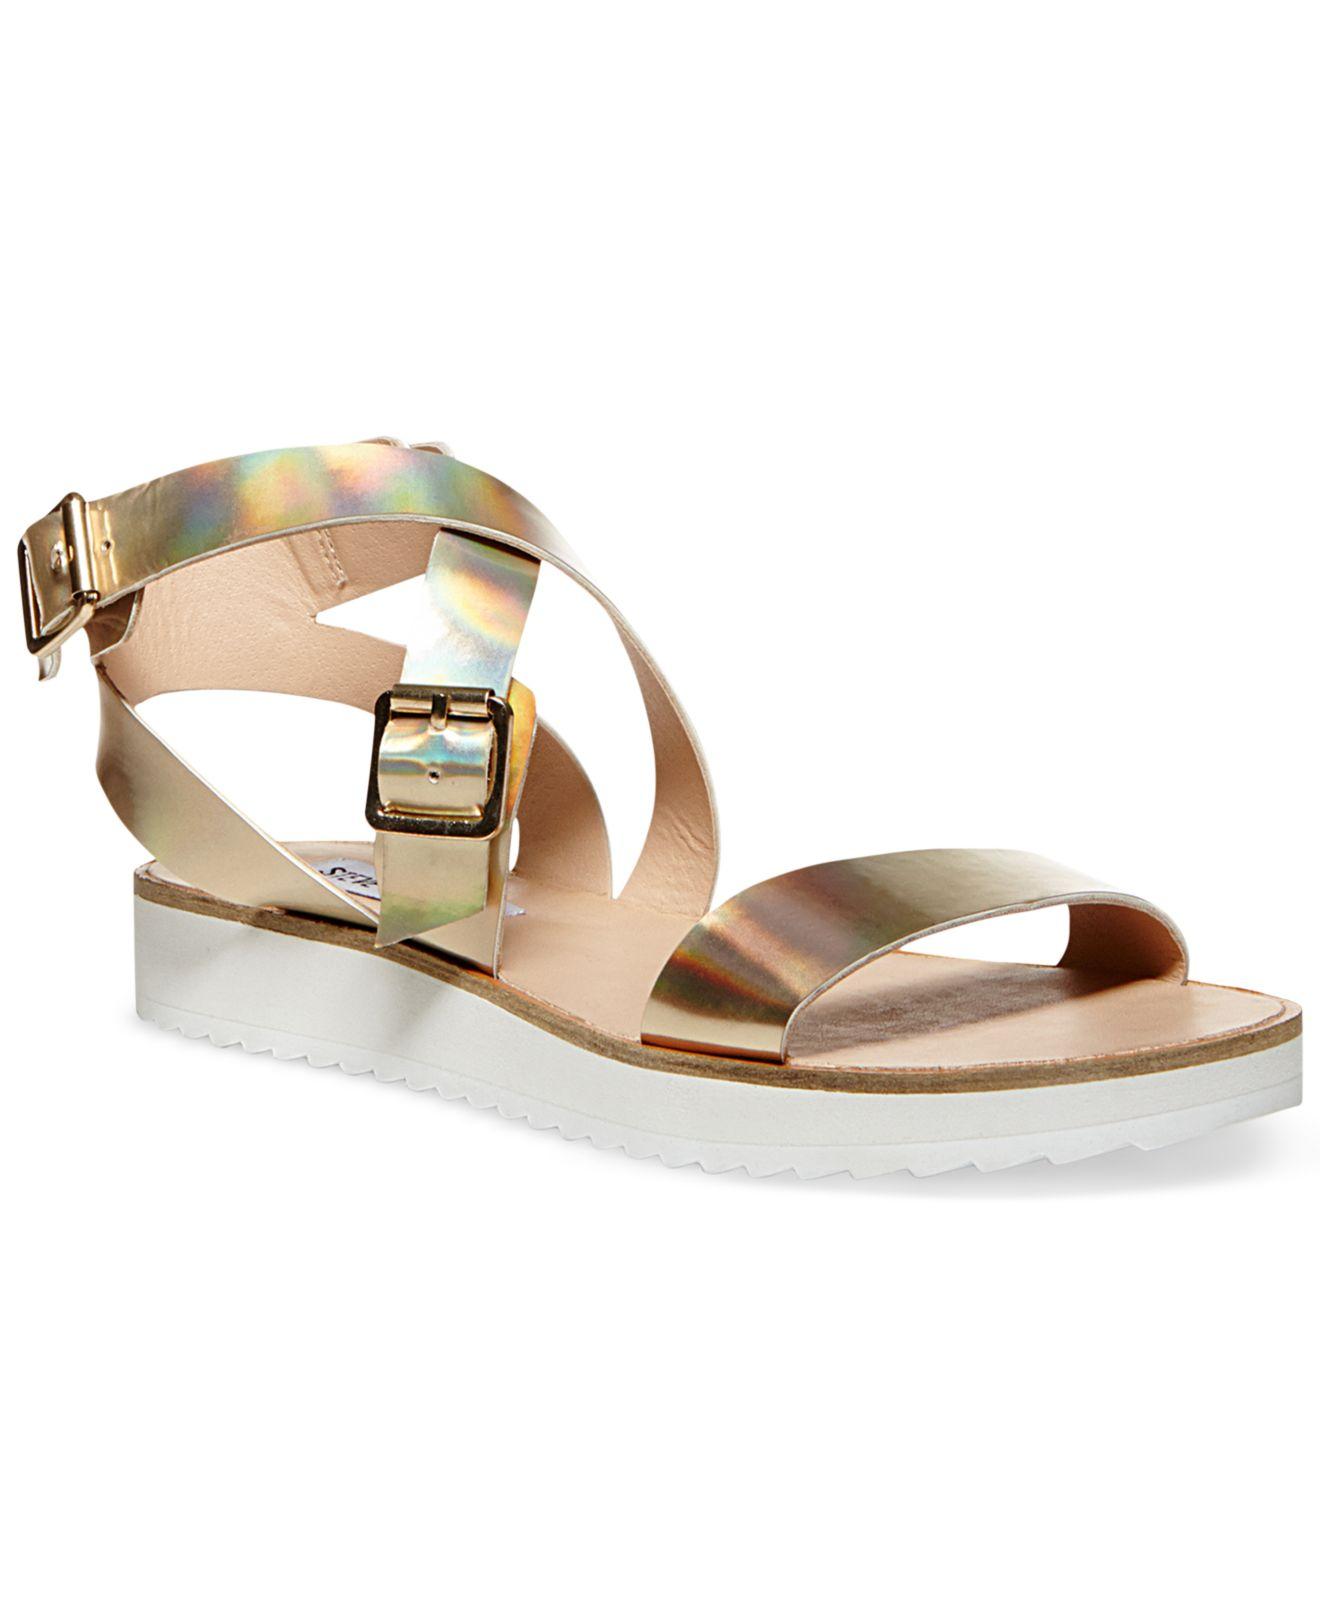 4046ecca539 Lyst - Steve Madden Mellow Flatform Sandals in Metallic